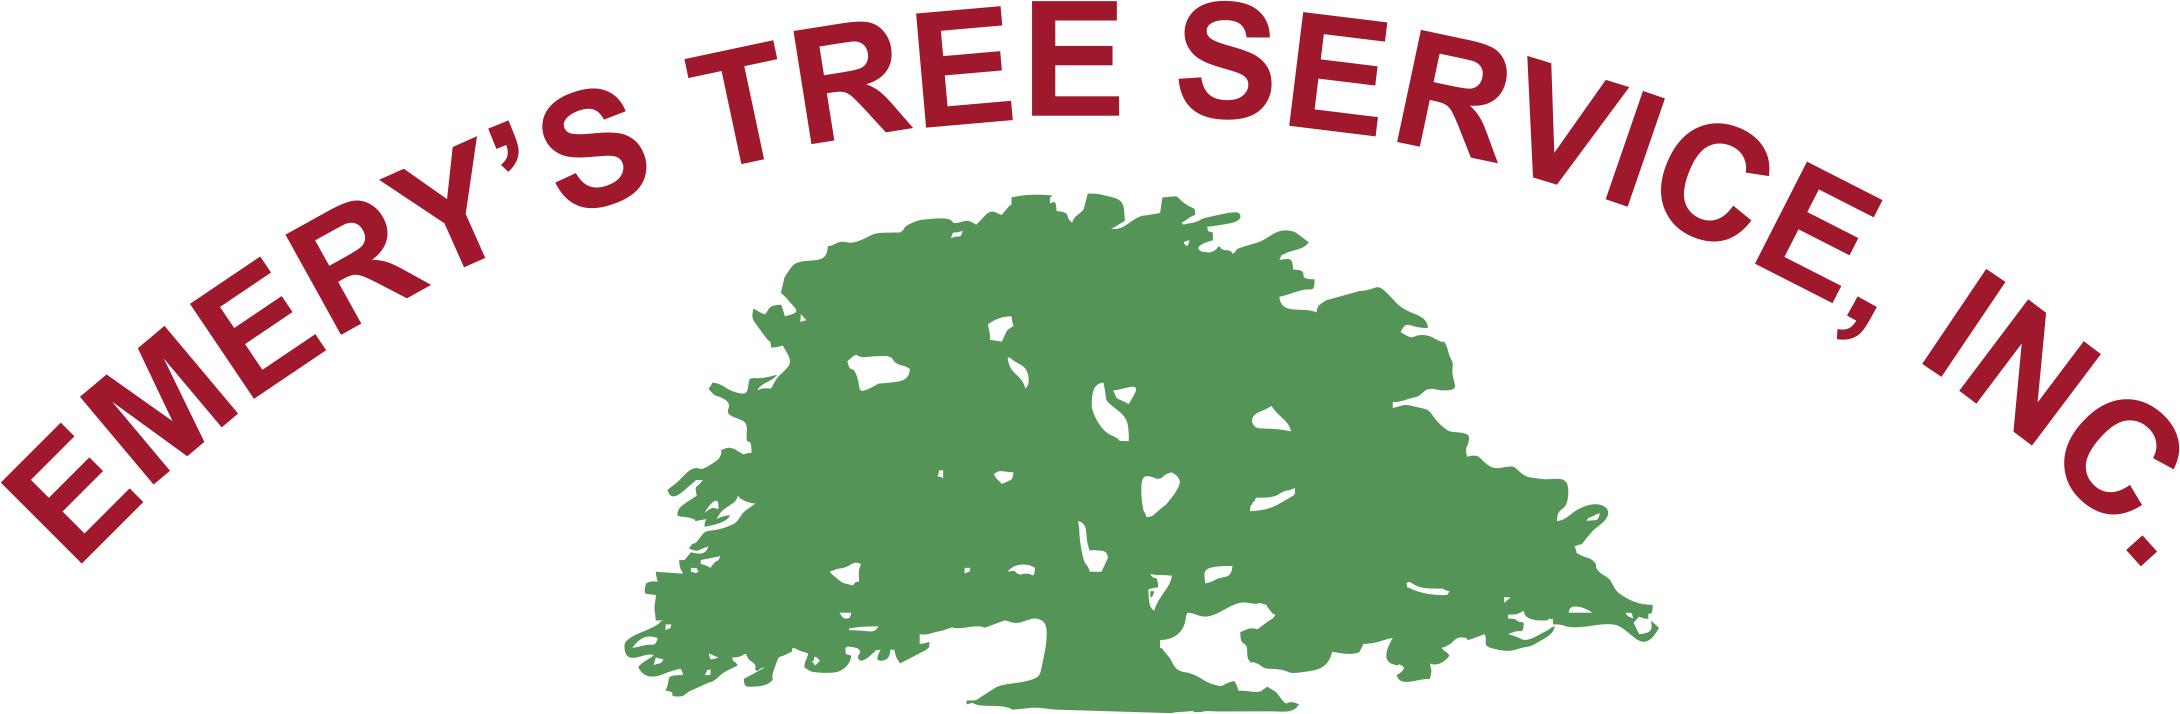 Emery Tree Service